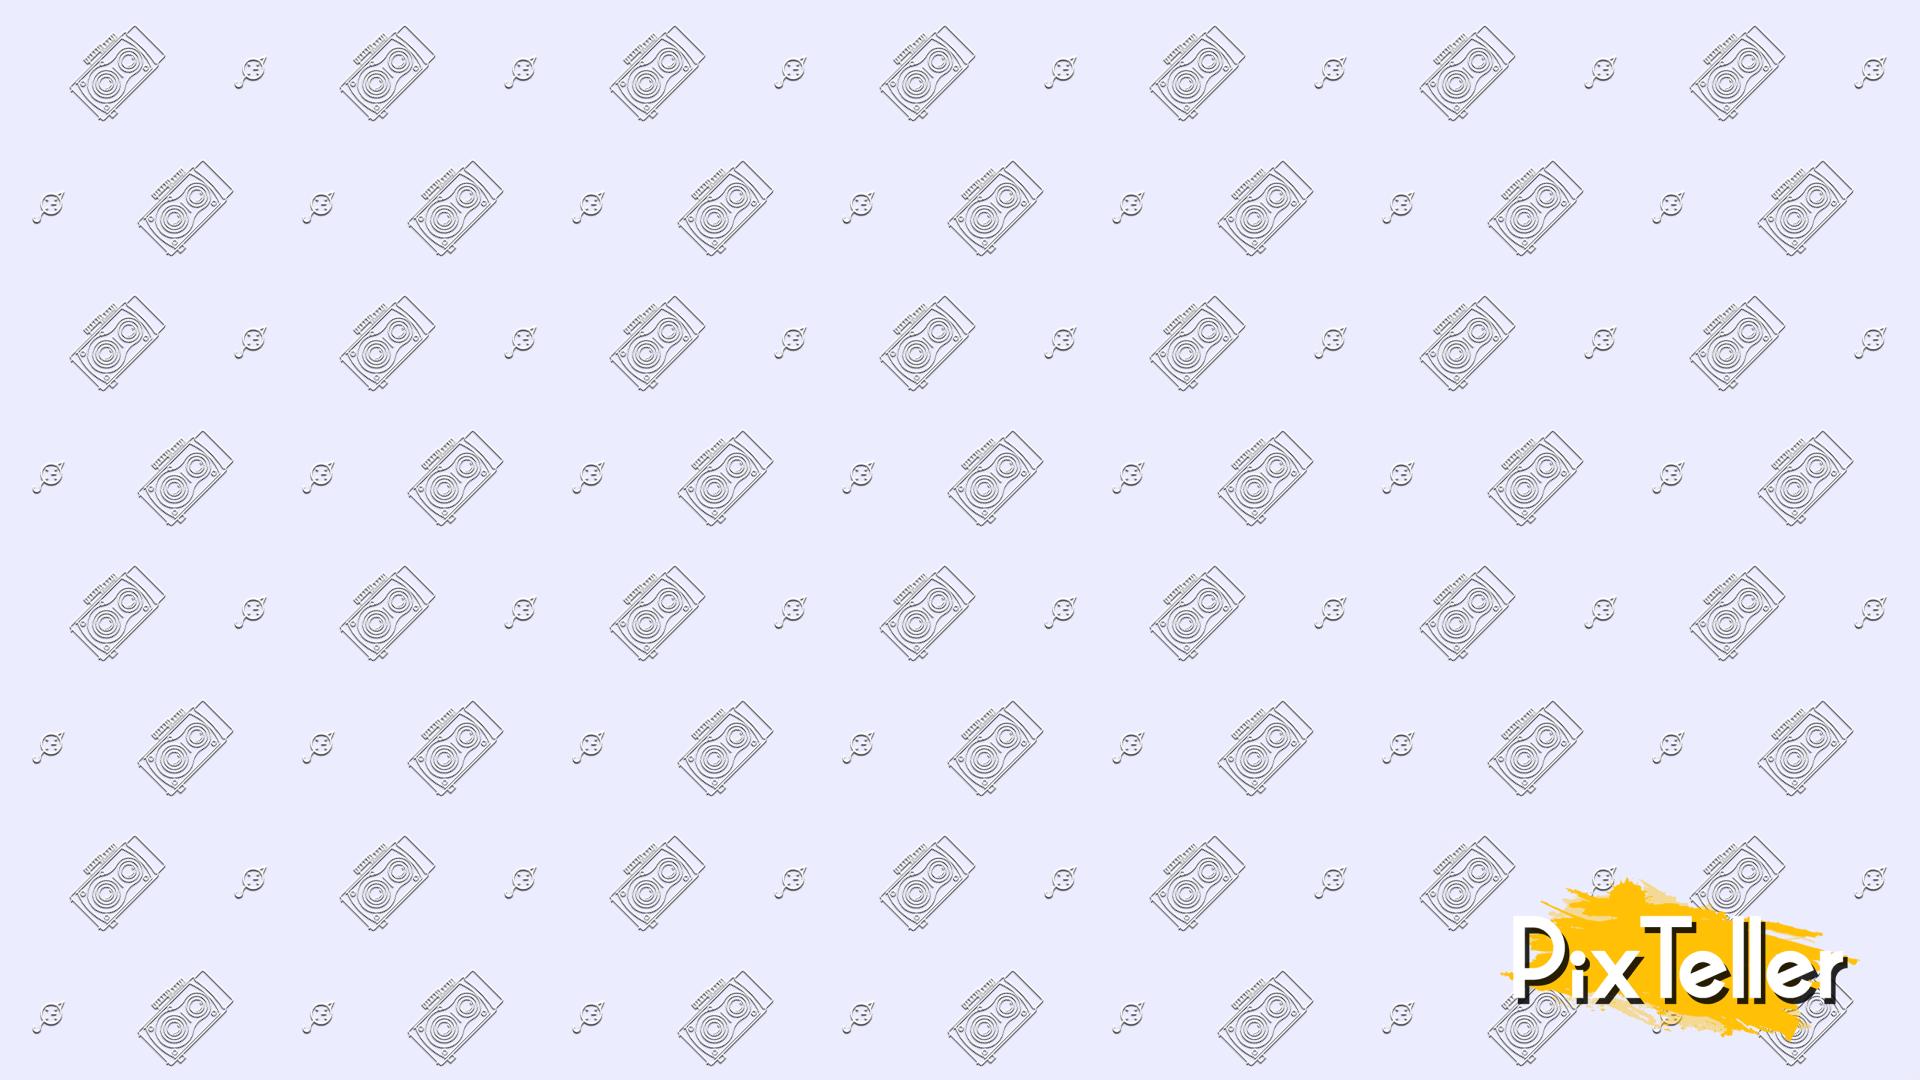 White,                Pattern,                Design,                Line,                Font,                Angle,                Wallpaper,                Product,                Photo,                Antique,                Technology,                Photographer,                Burden,                 Free Image